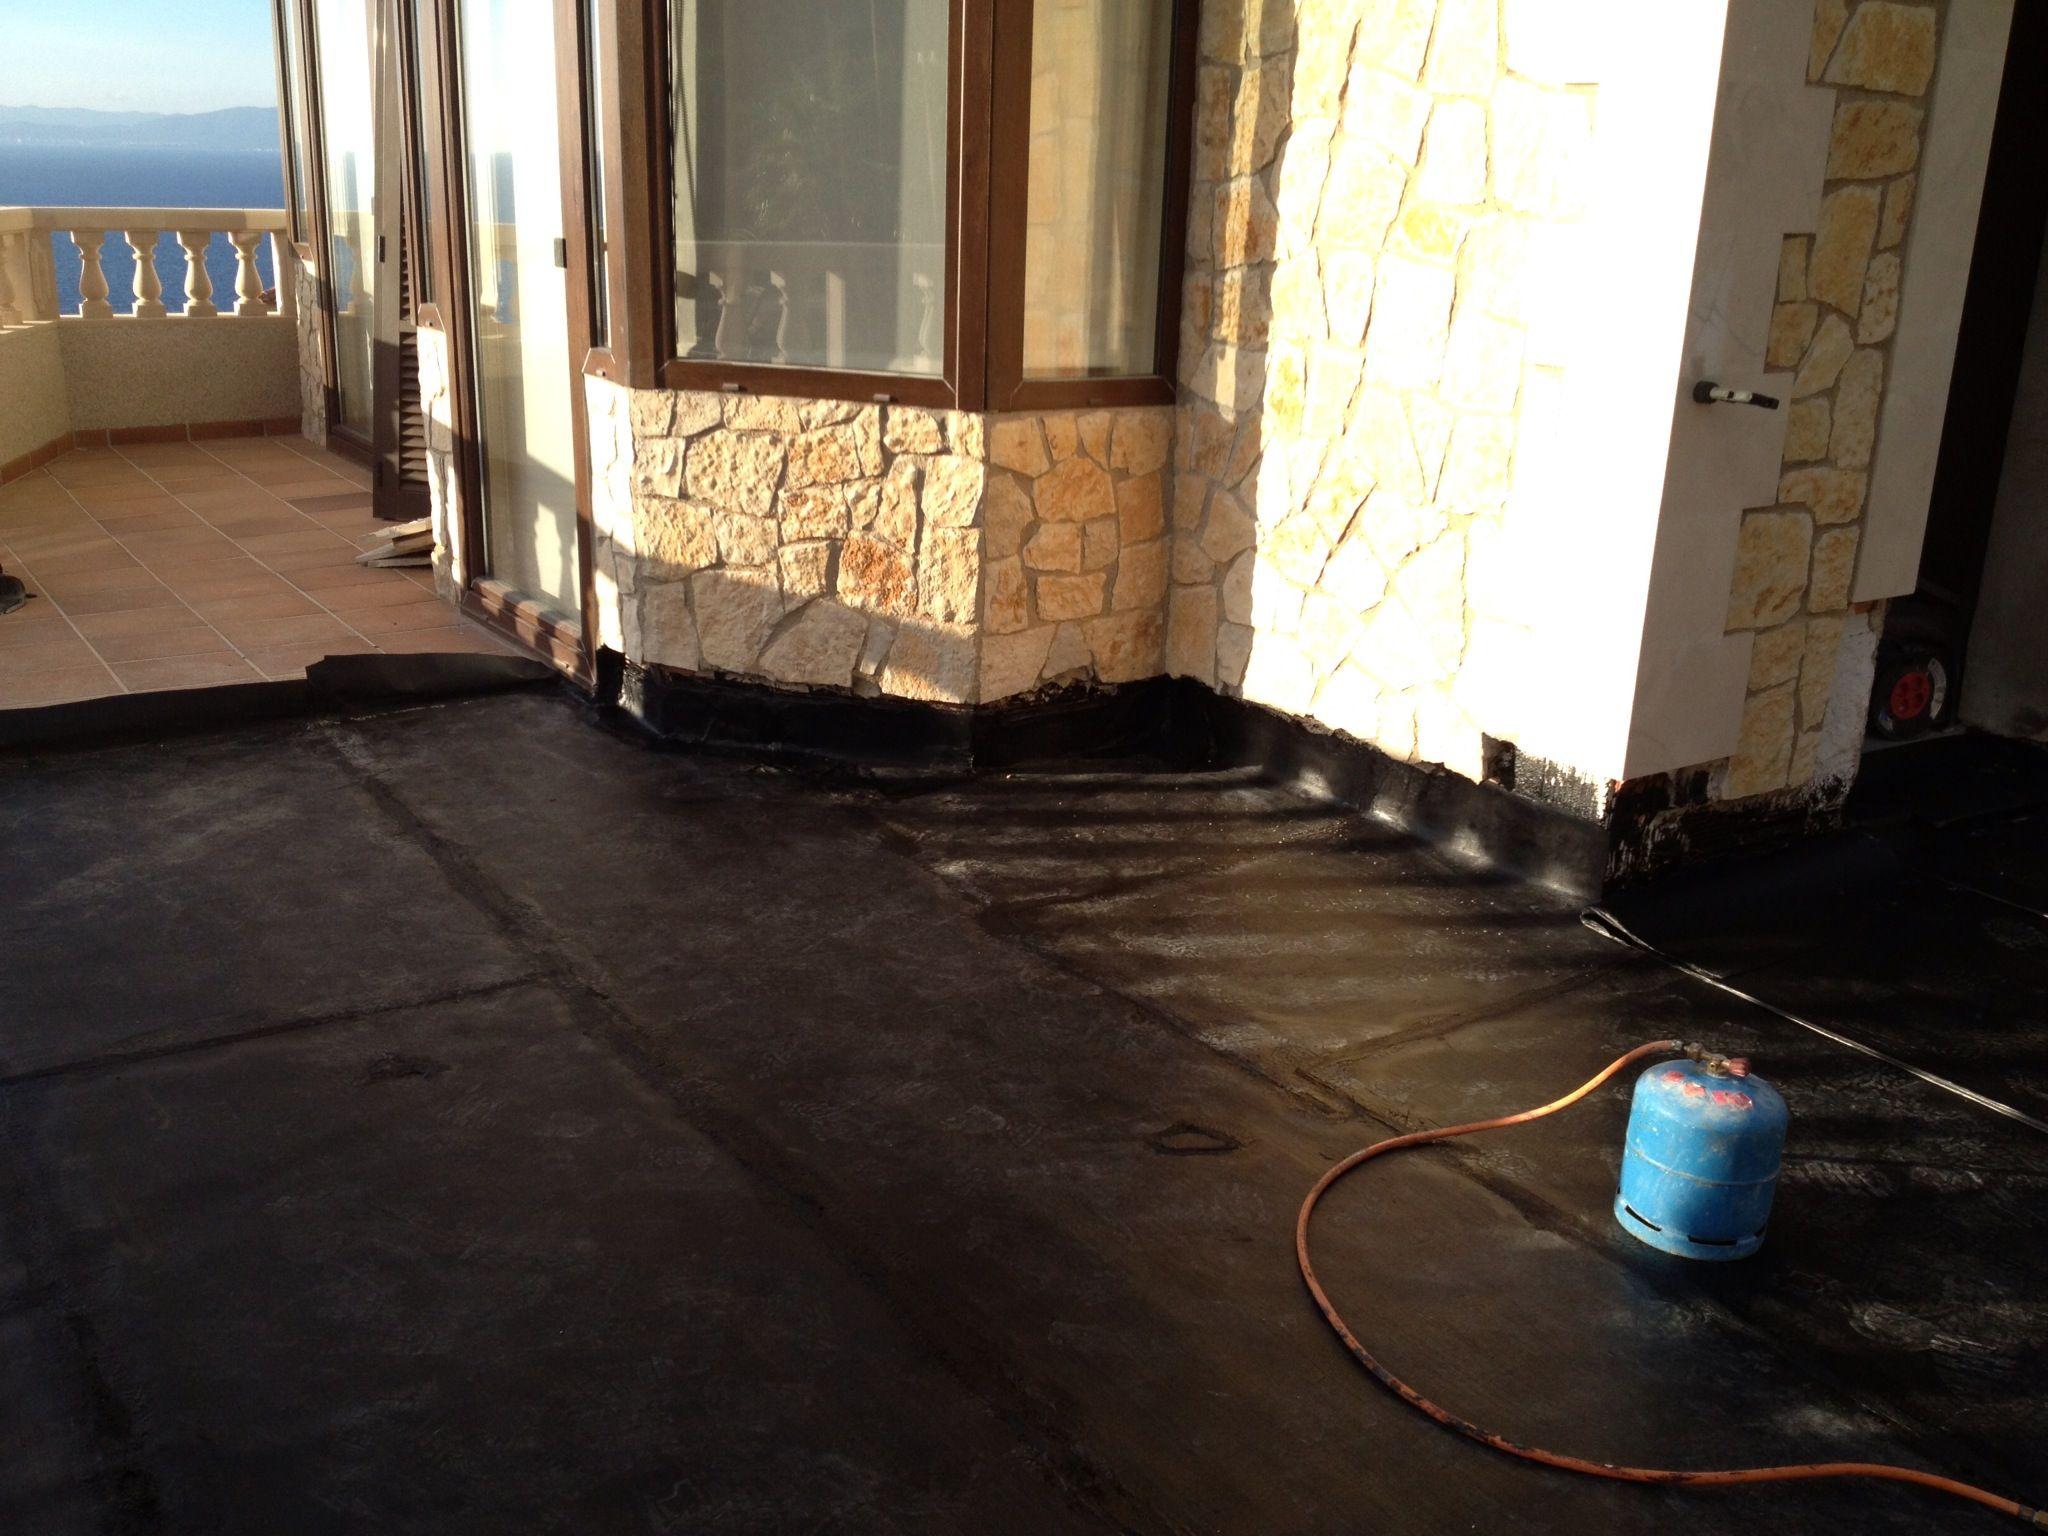 Trabajando para impermeabilizar una terraza en Bahía Azul (Palma de Mallorca)